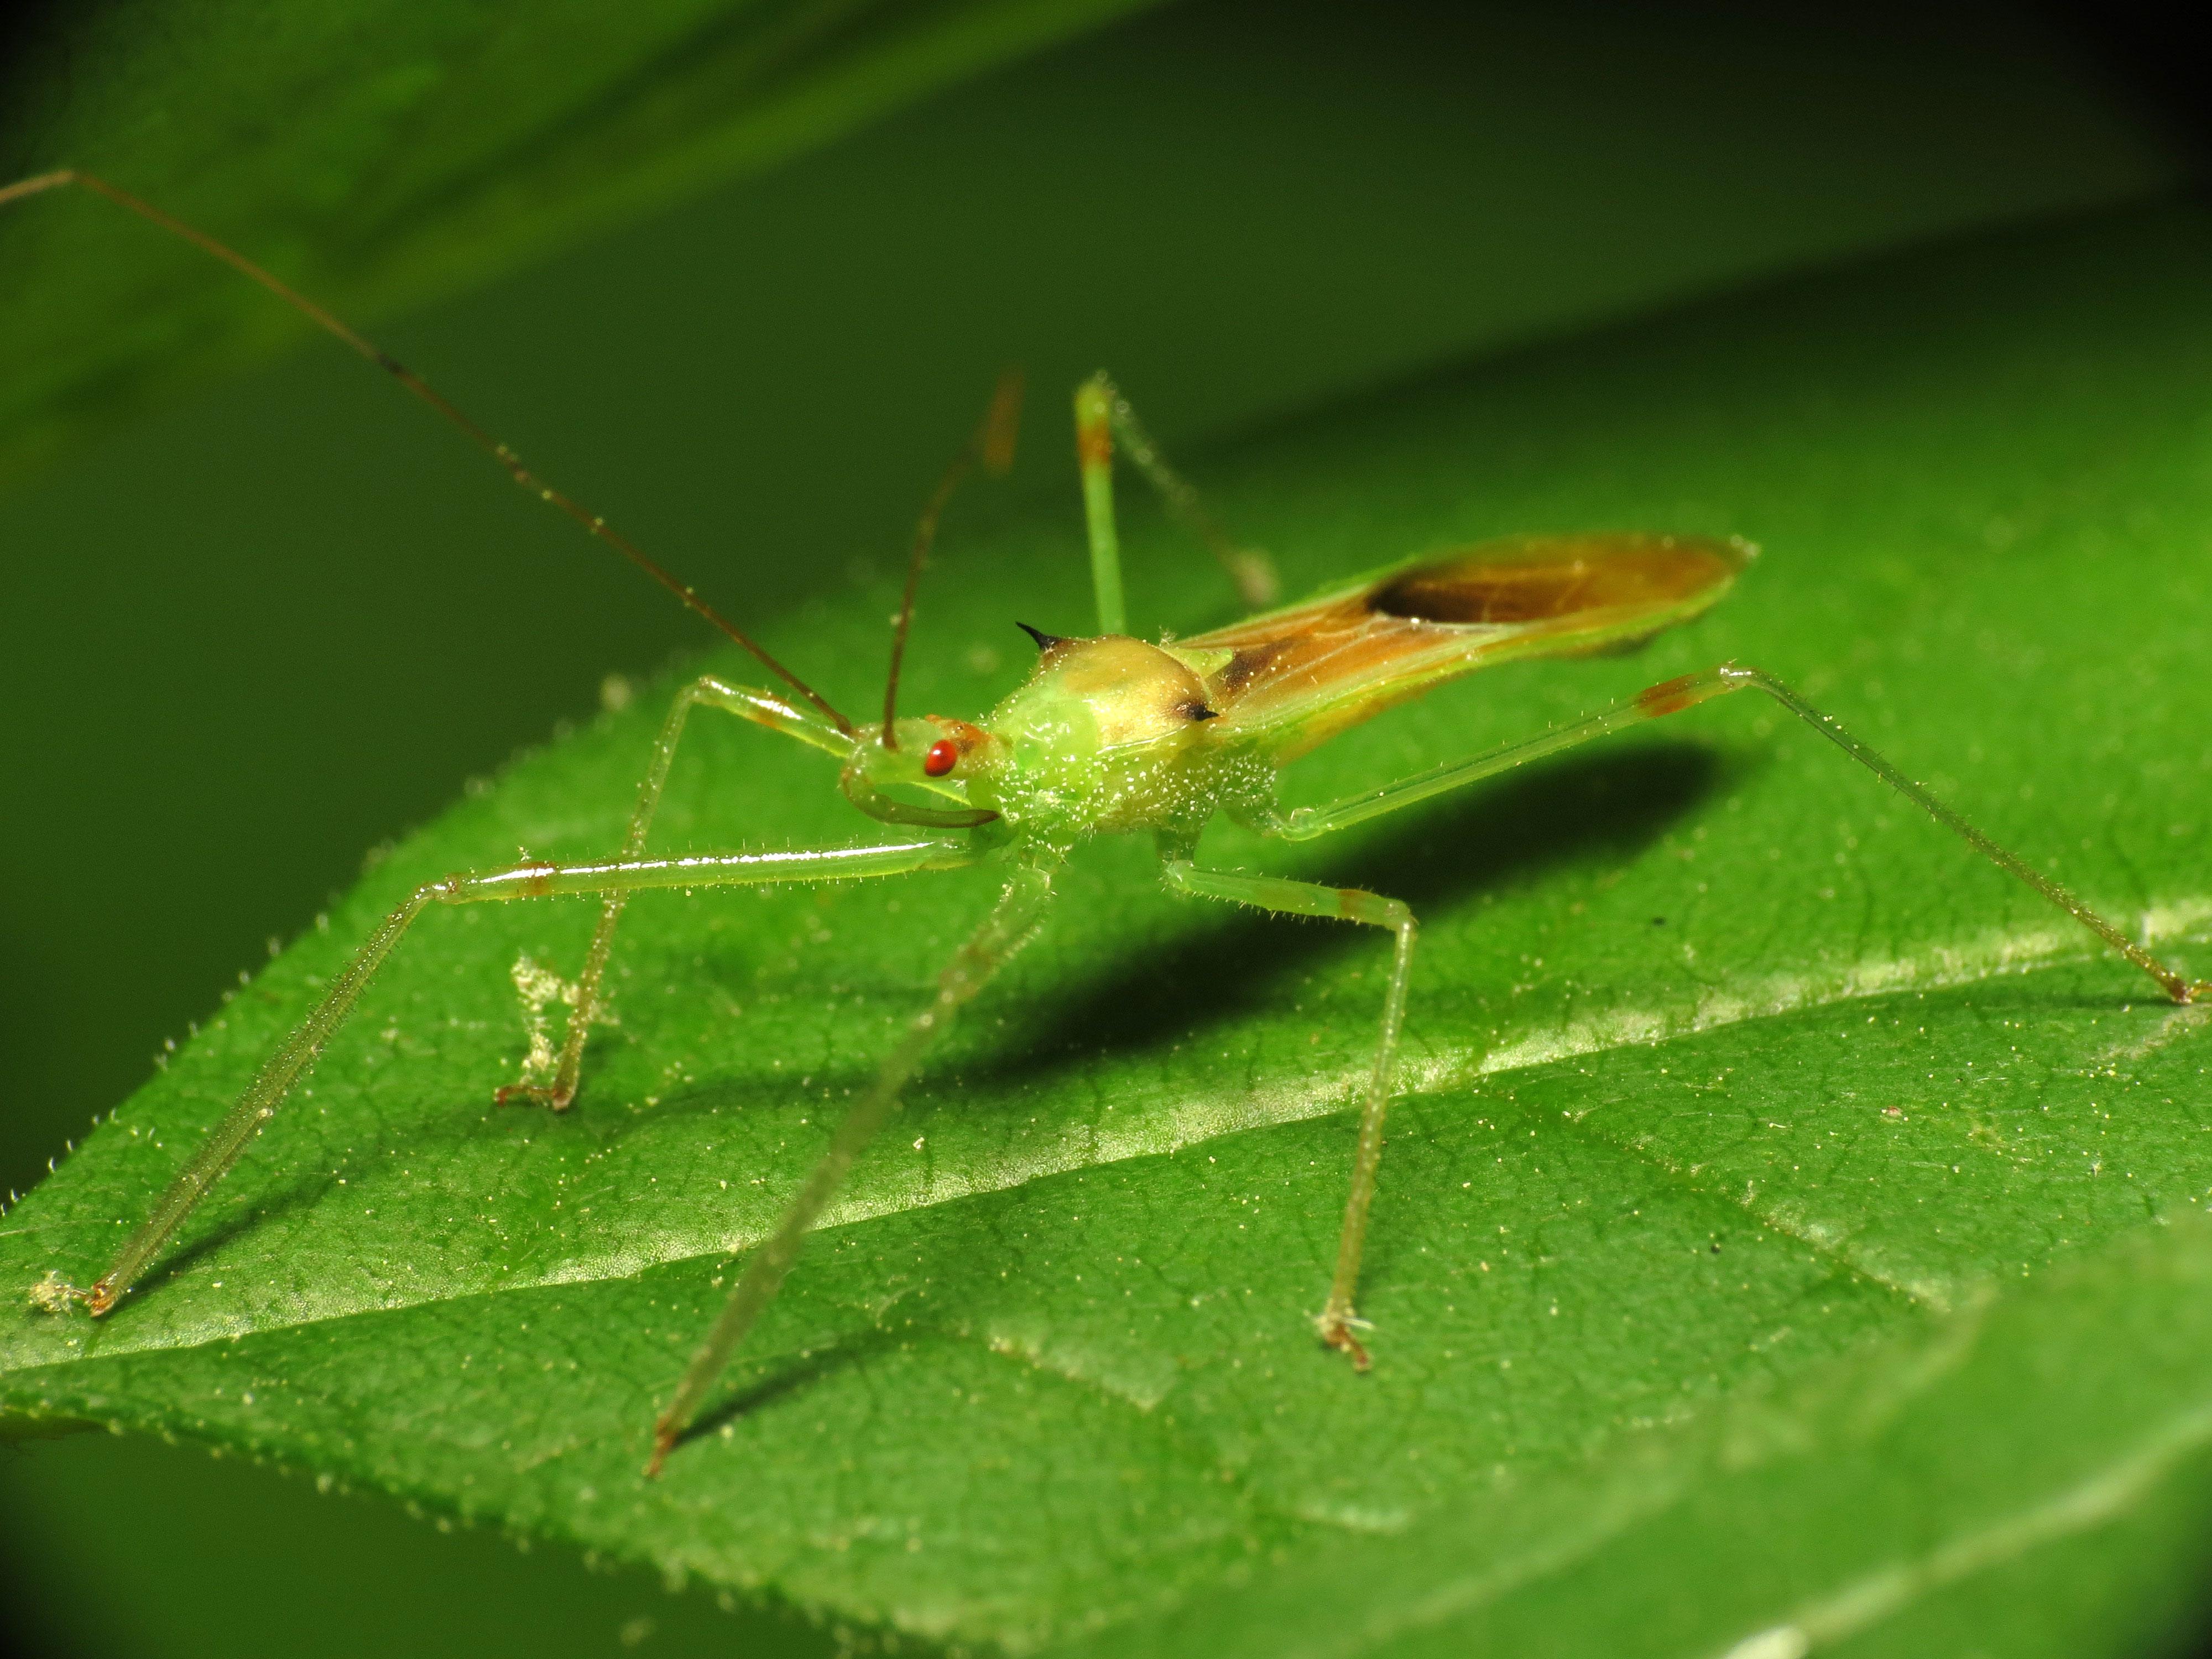 Zelus luridus - Wikipedia